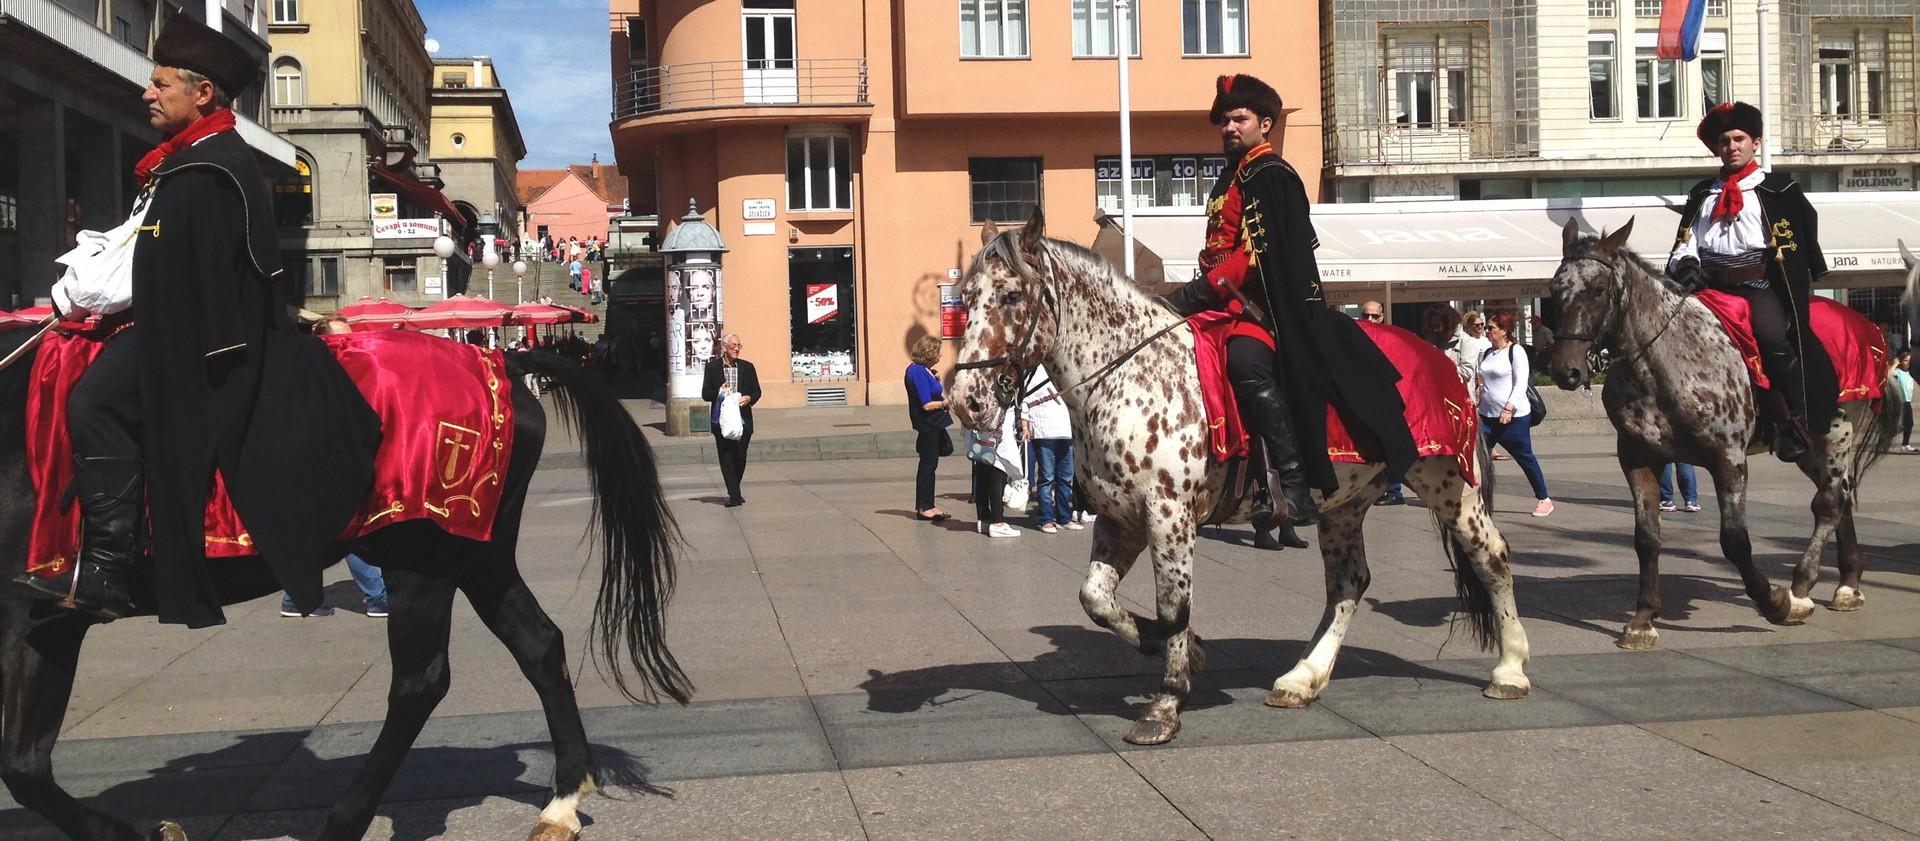 DOBAR DAN CROATIA! – PART 1 – ZAGREB and Northern Dalmatia